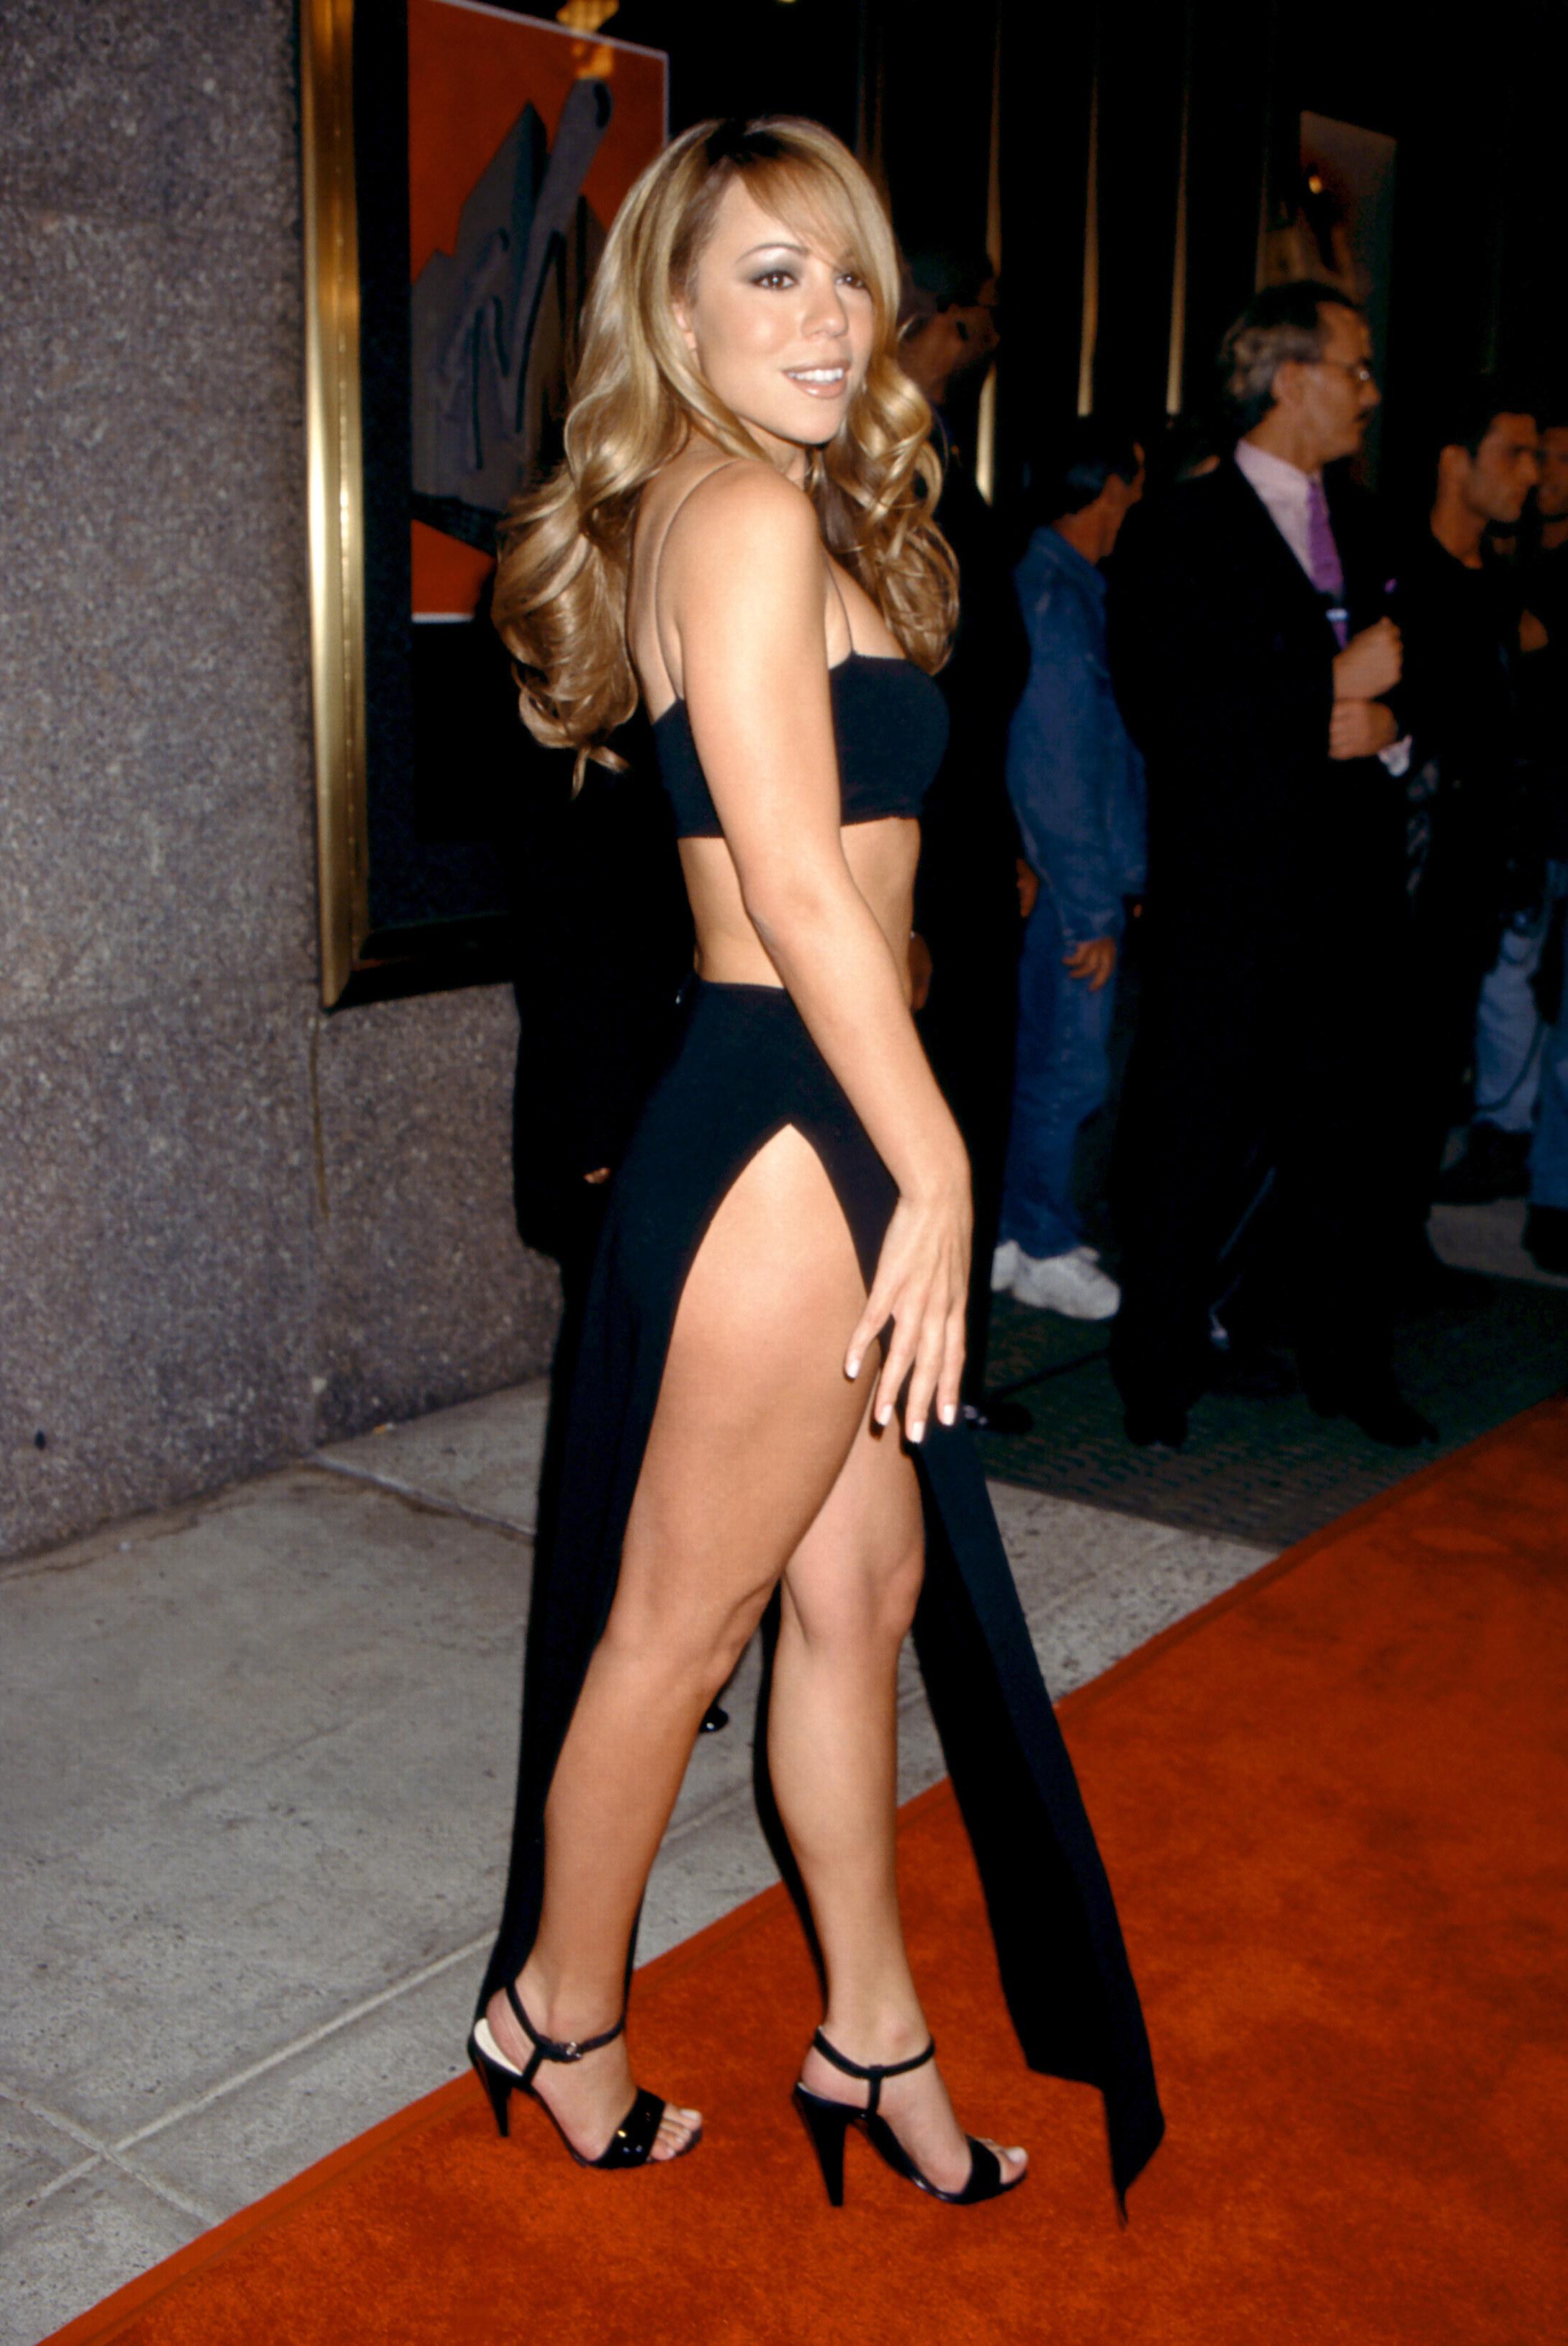 Mariah Carey at the 1997 Video Music Awards